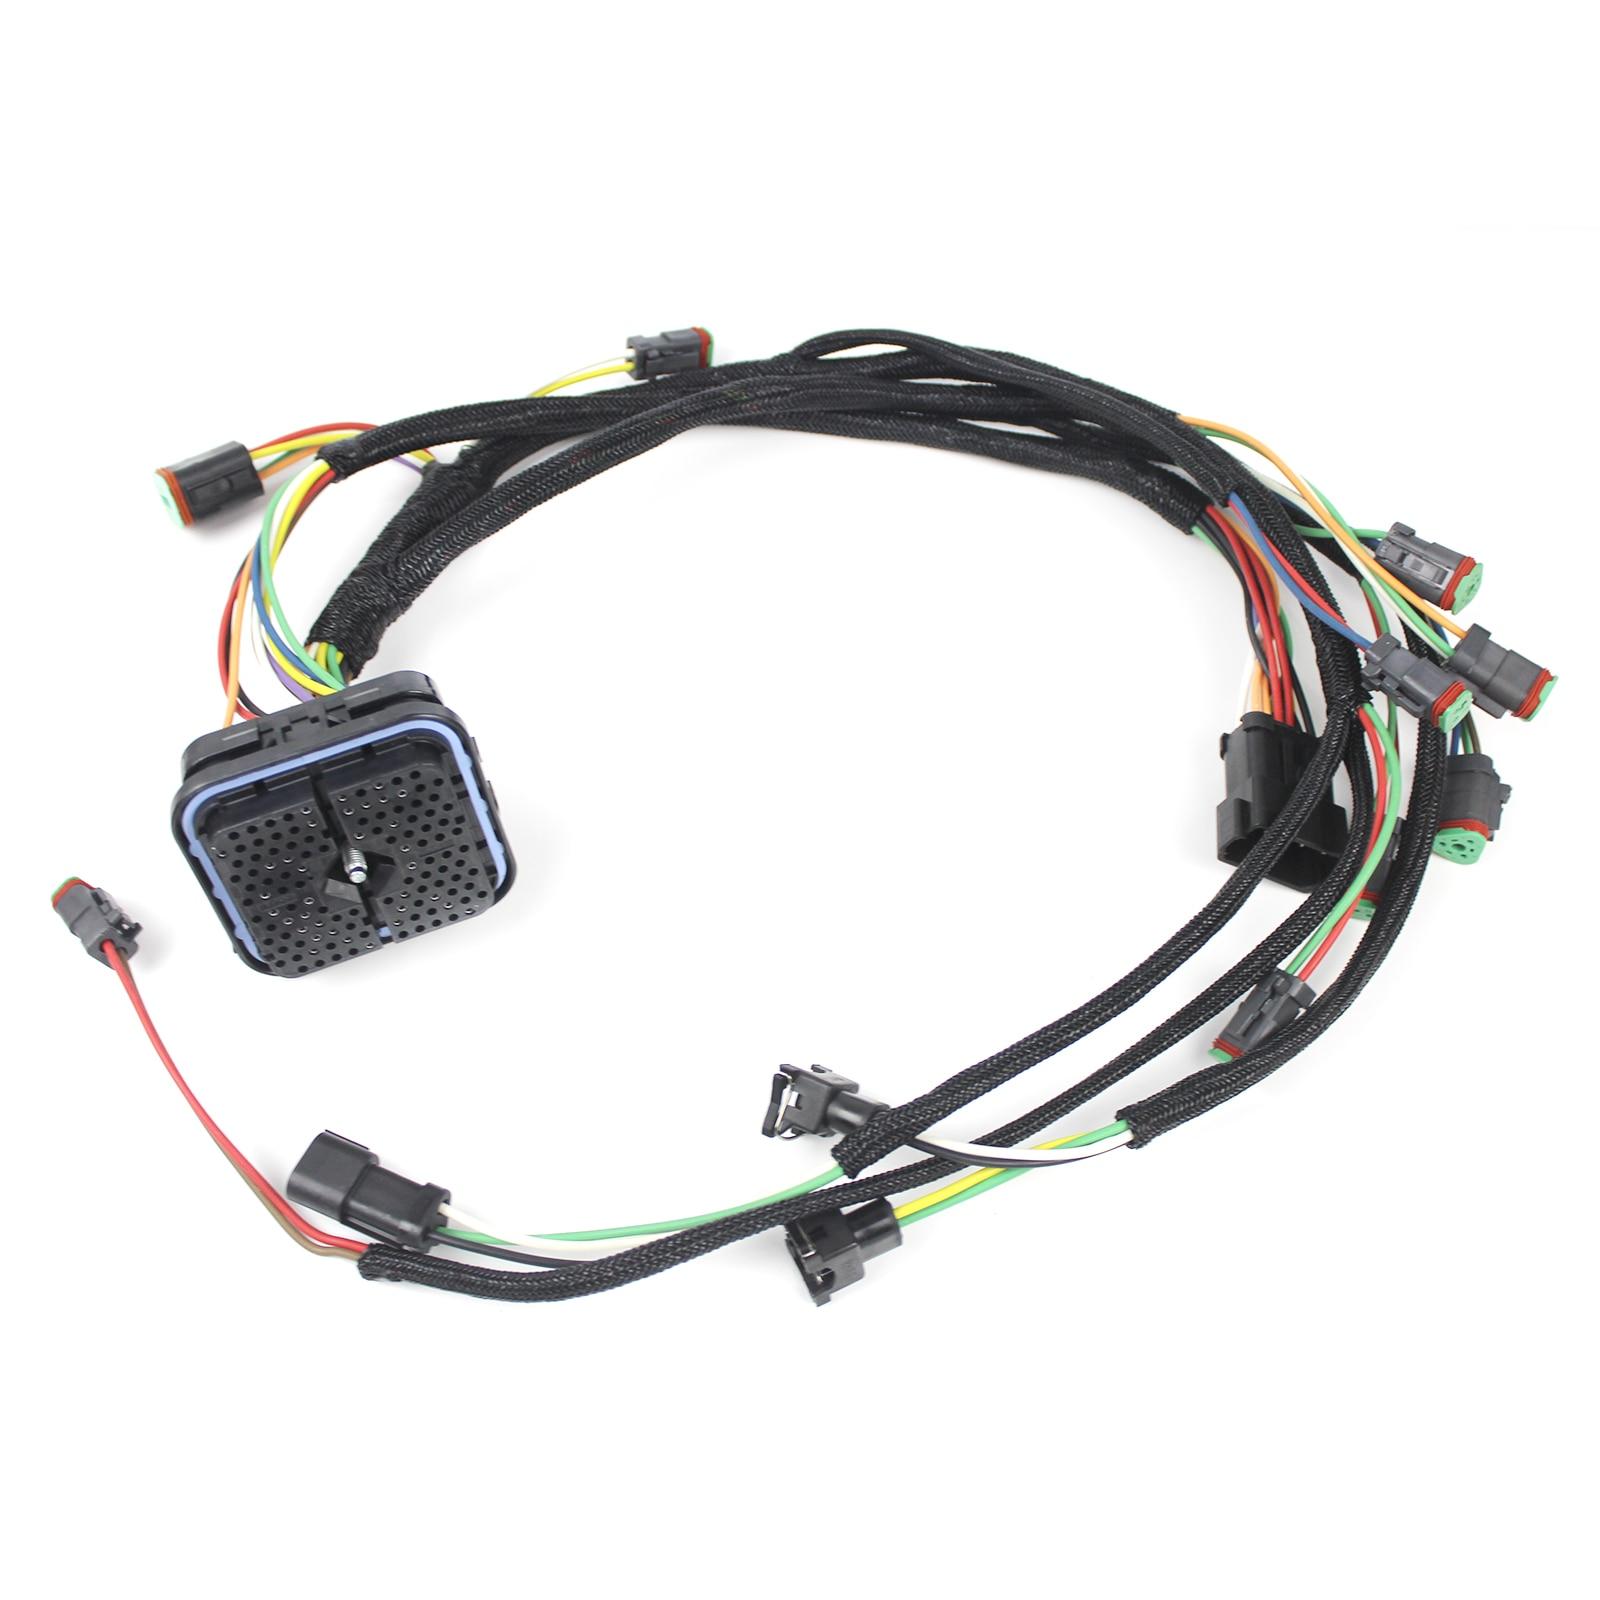 Kable w wiązce 198-2713 1982713 pasuje do 325D E325D silnika C7 z 1 rok gwarancji